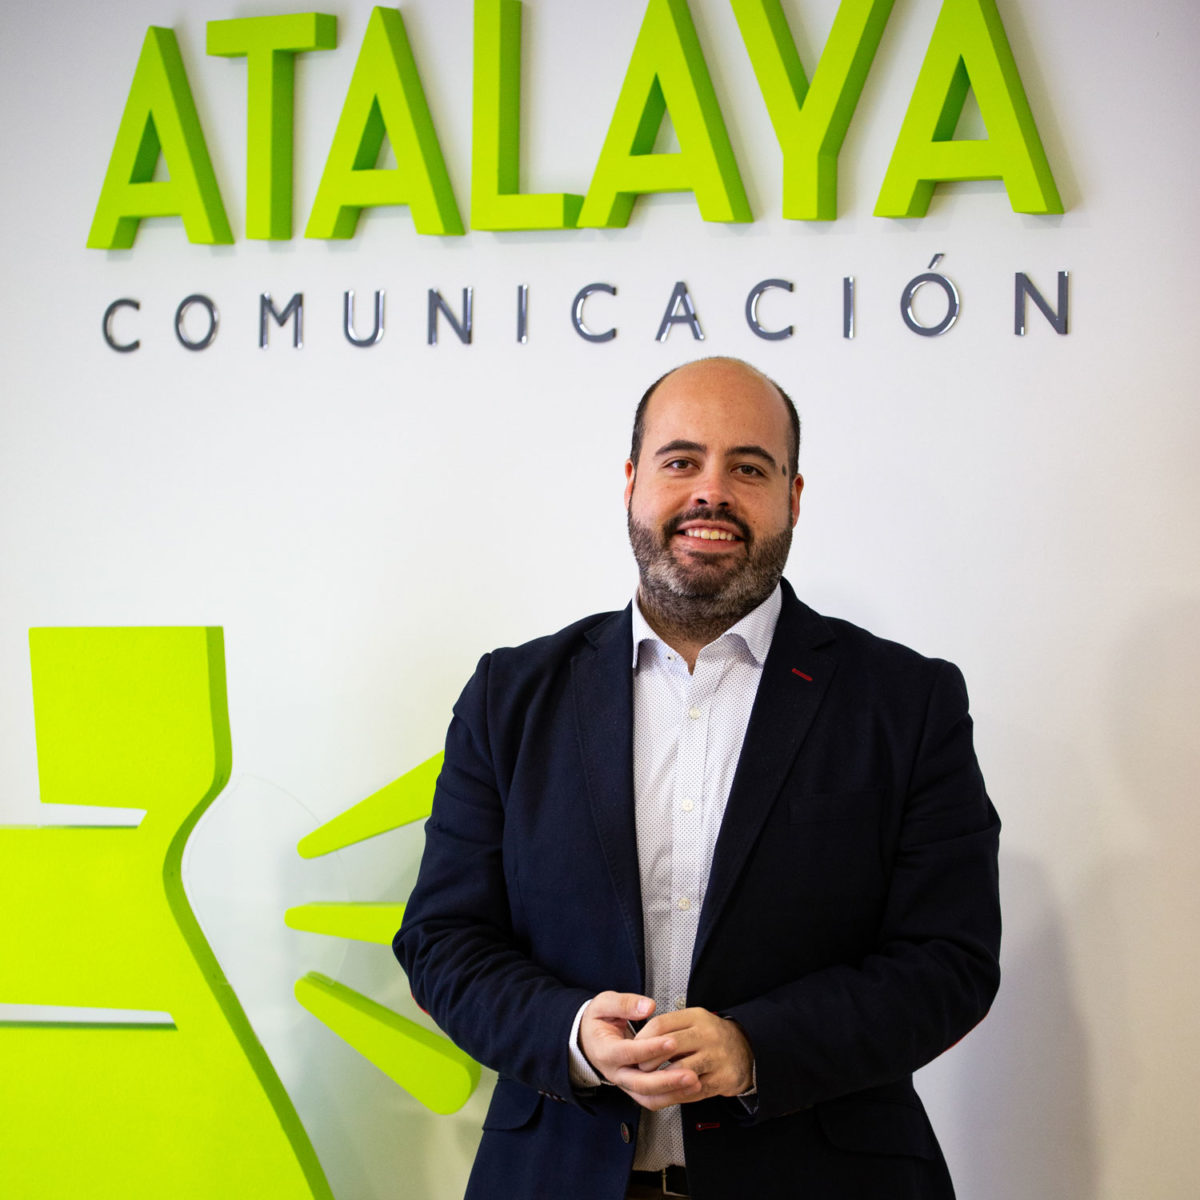 Pablo Vázquez Sande - Atalaya